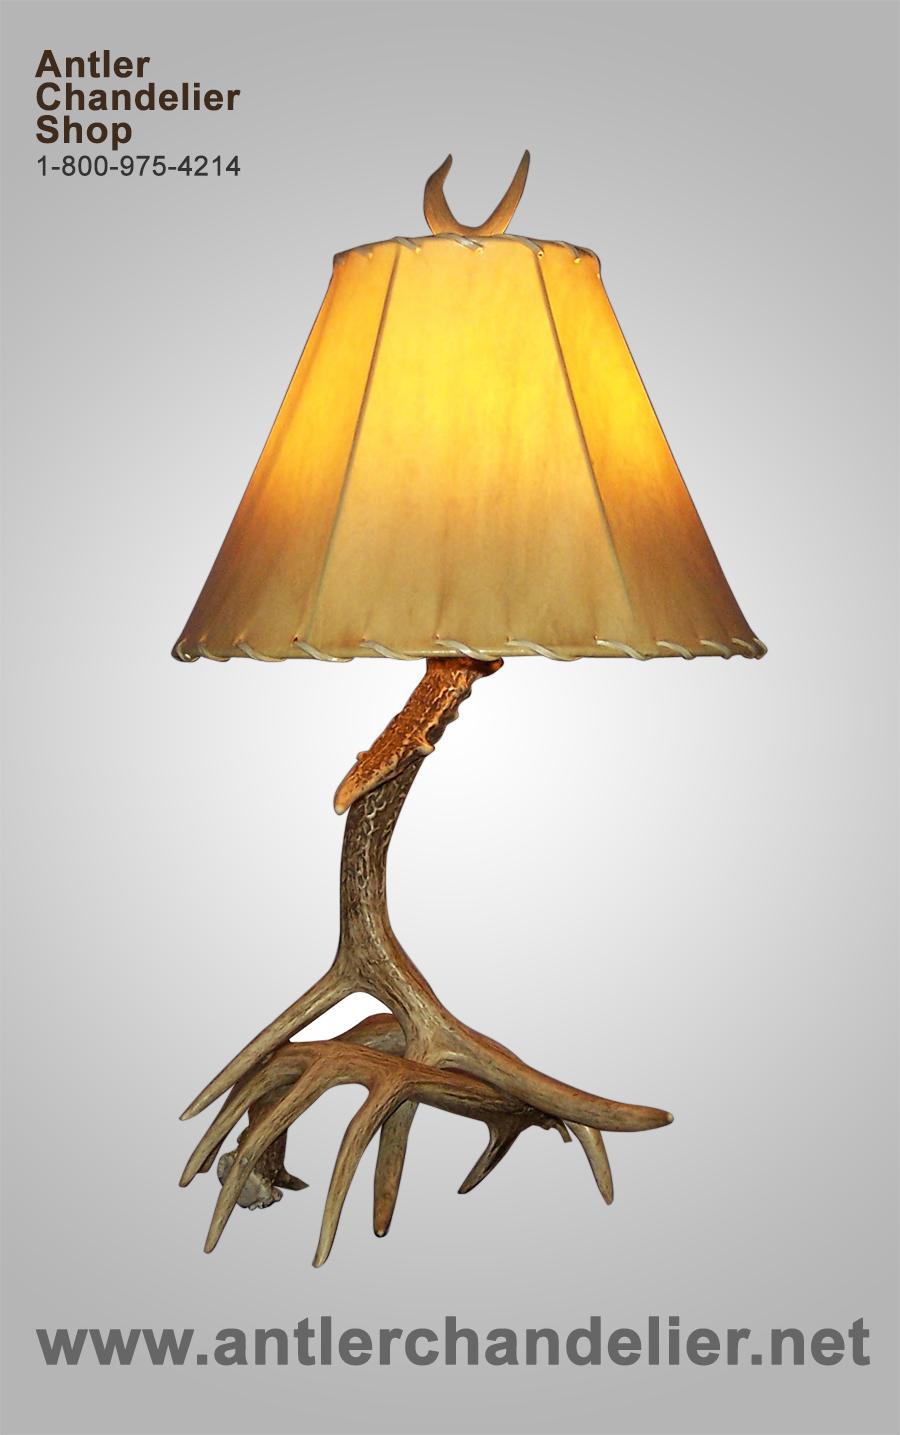 WHITE TAIL DEER ANTLER TABLE LAMP, Rustic, Chandelier, Lighting | eBay